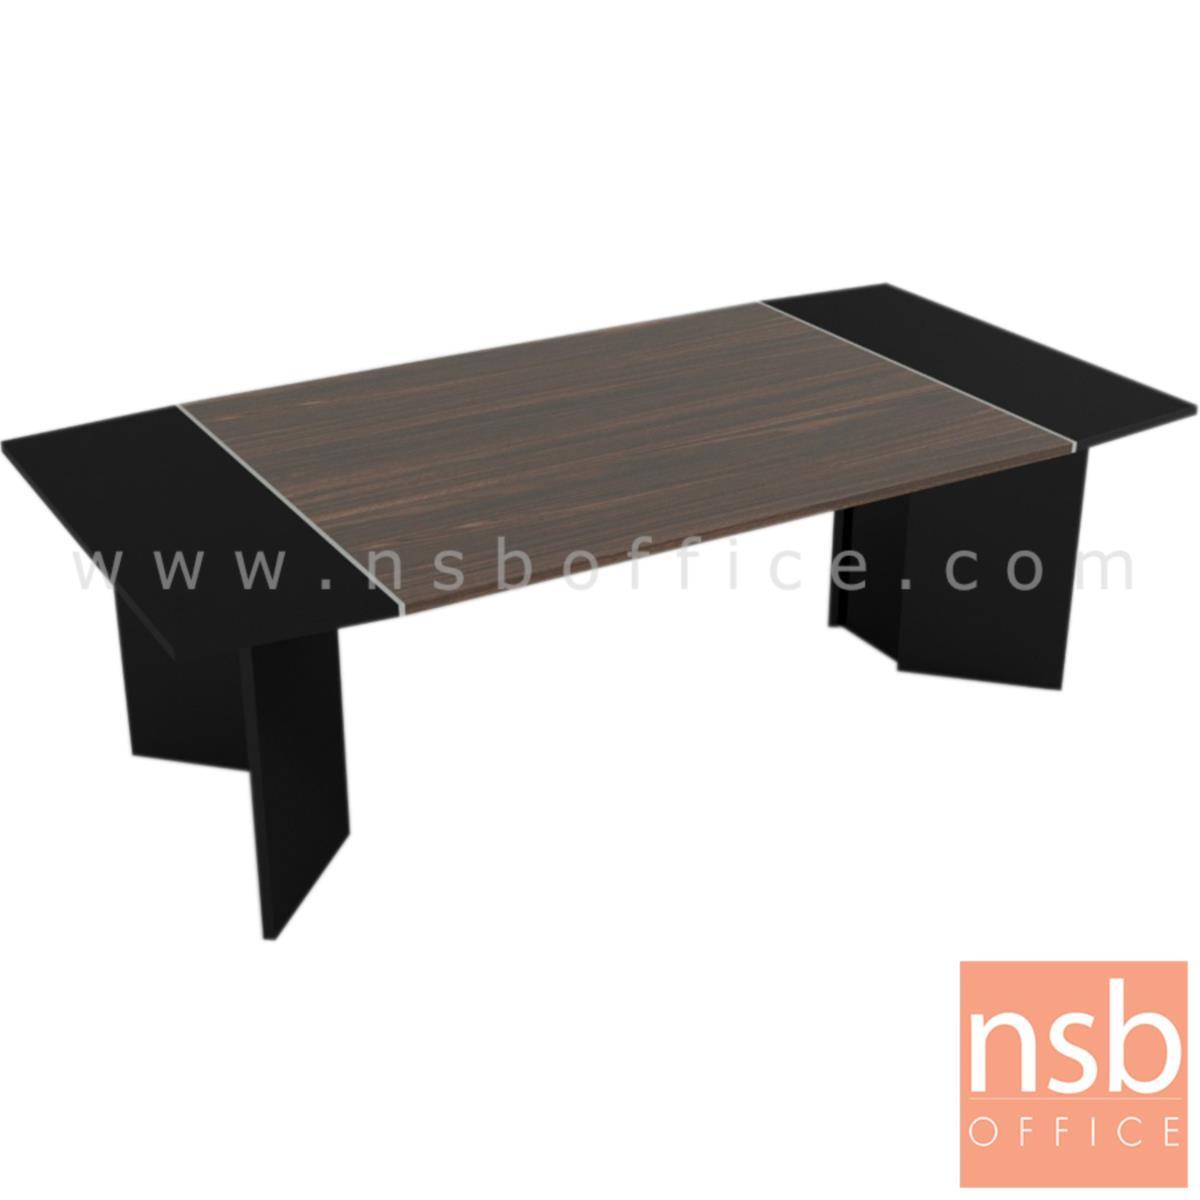 A05A204:โต๊ะประชุมทรงสี่เหลี่ยมคางหมู BAVARIA (บาวาเรีย)  240W cm. สีมอคค่าวอลนัท-ดำ